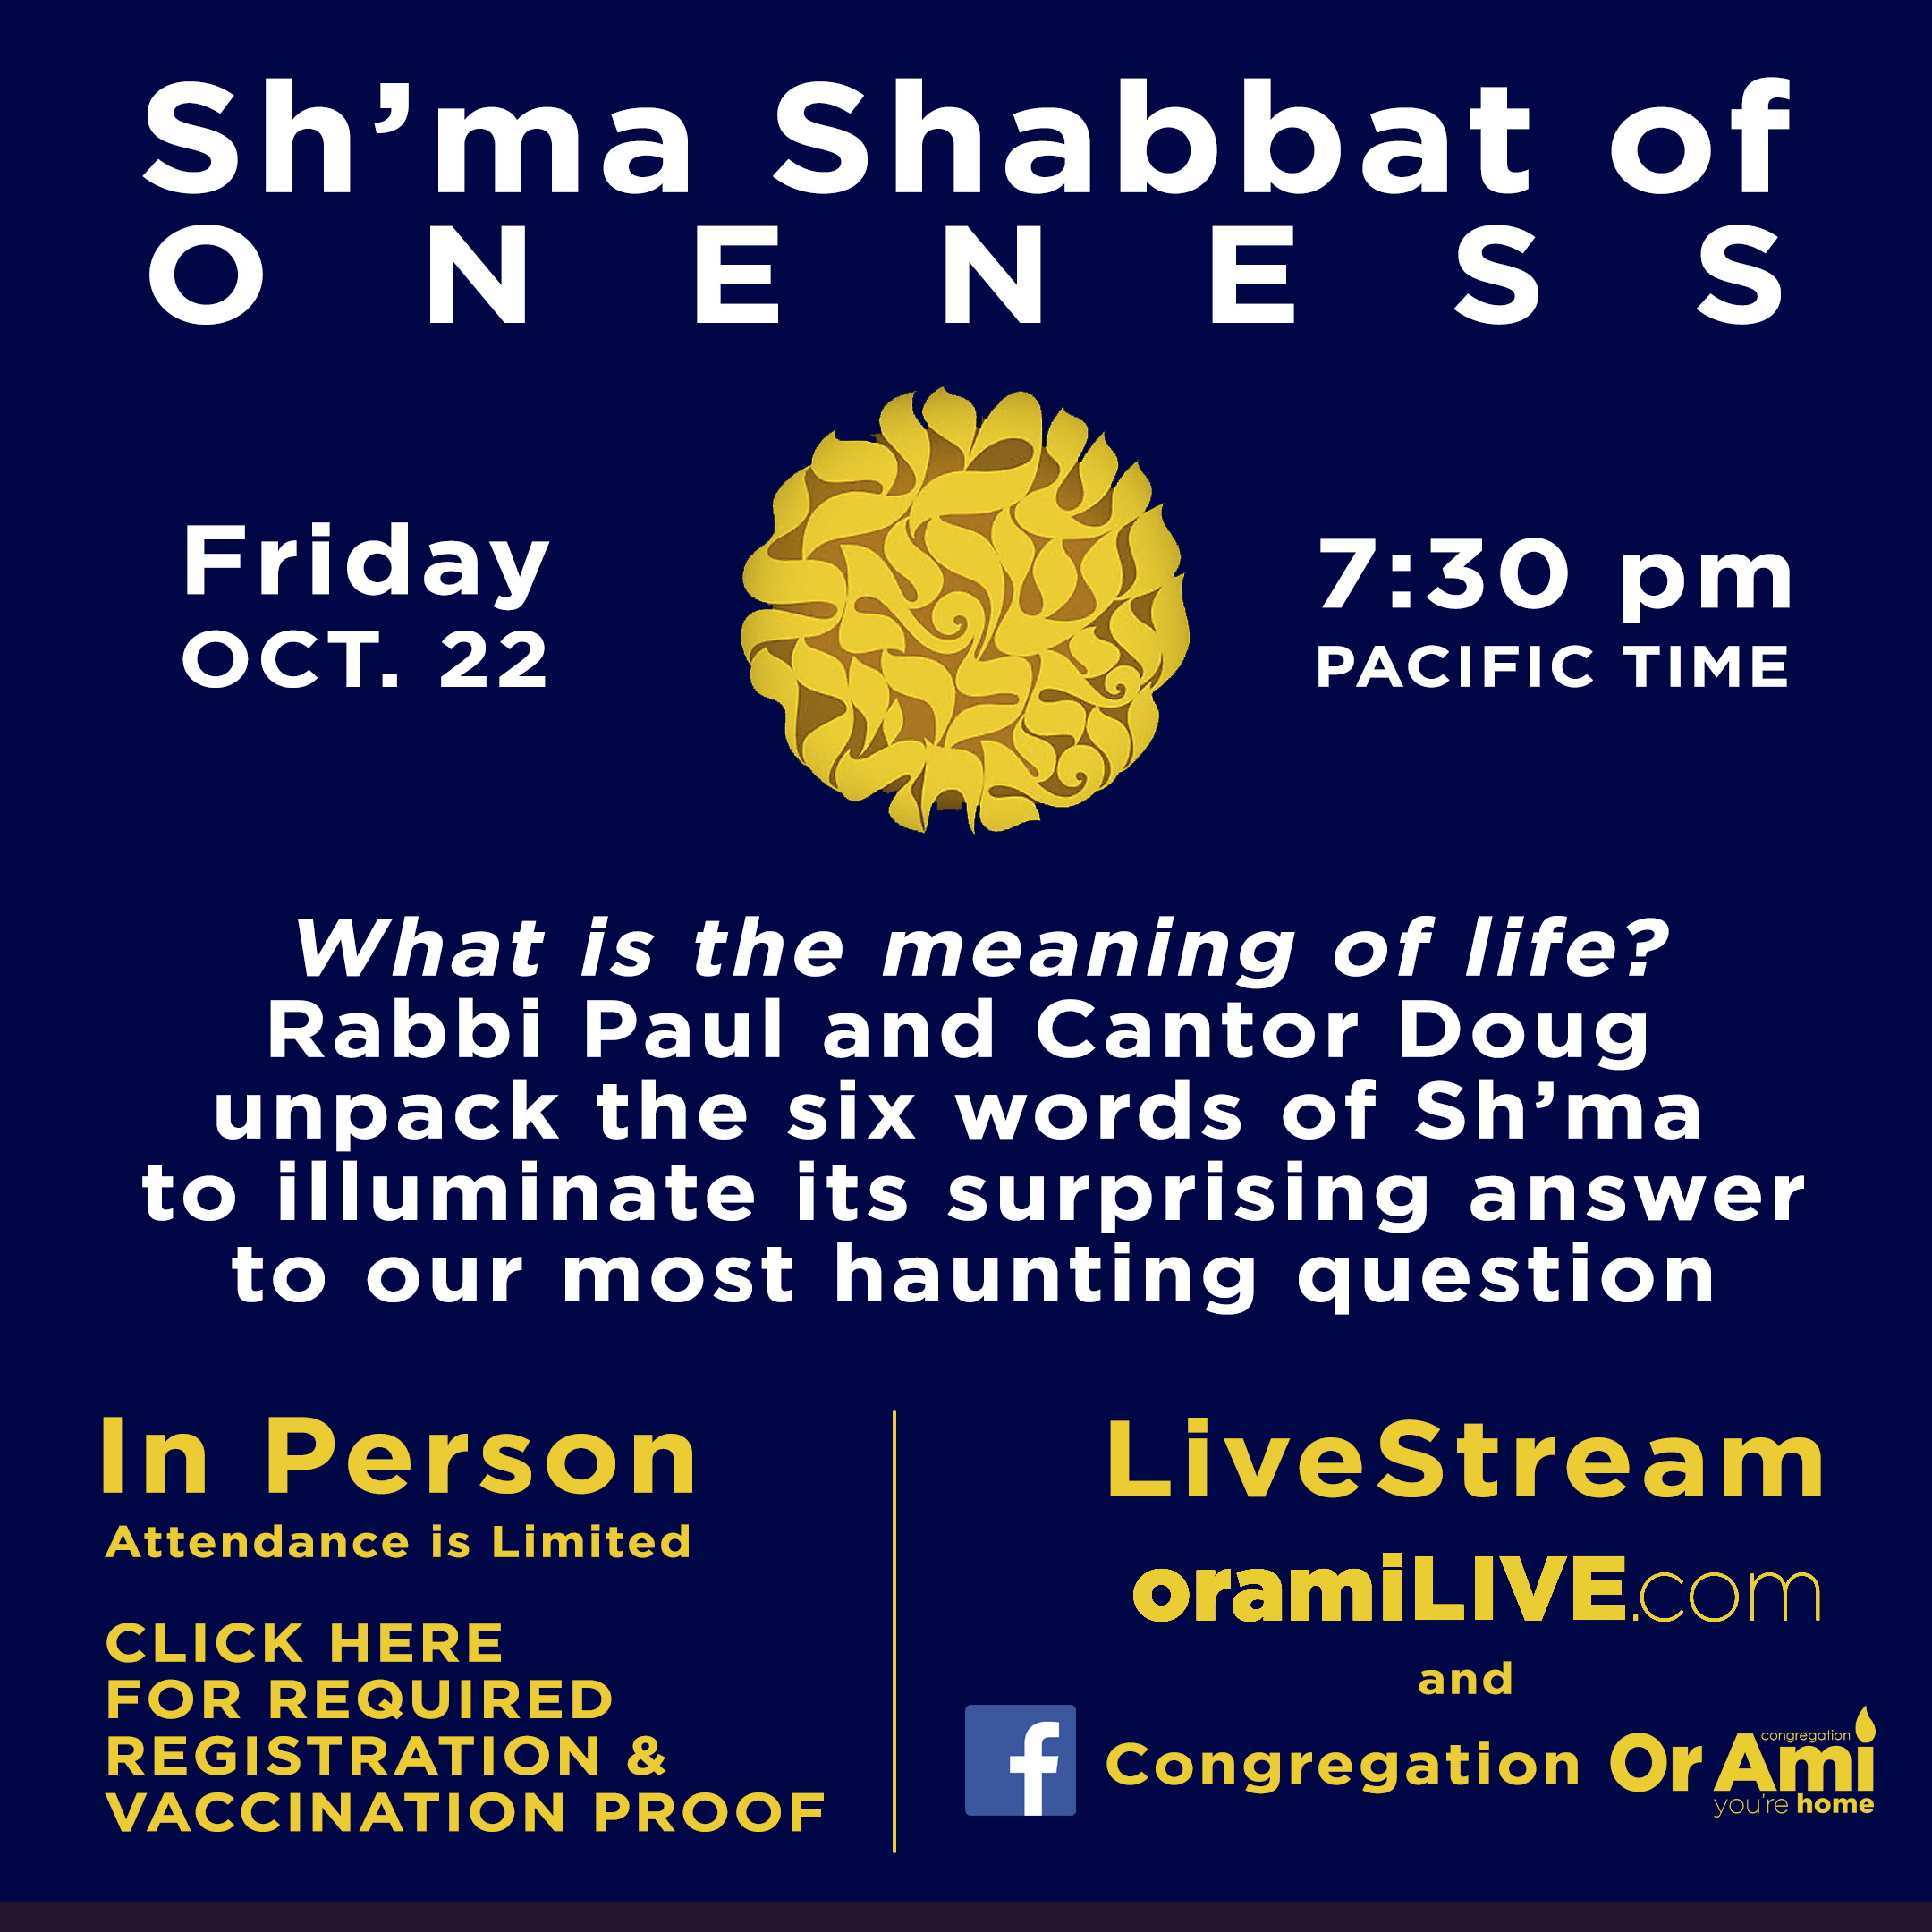 shma shabbat 10-22 with Click